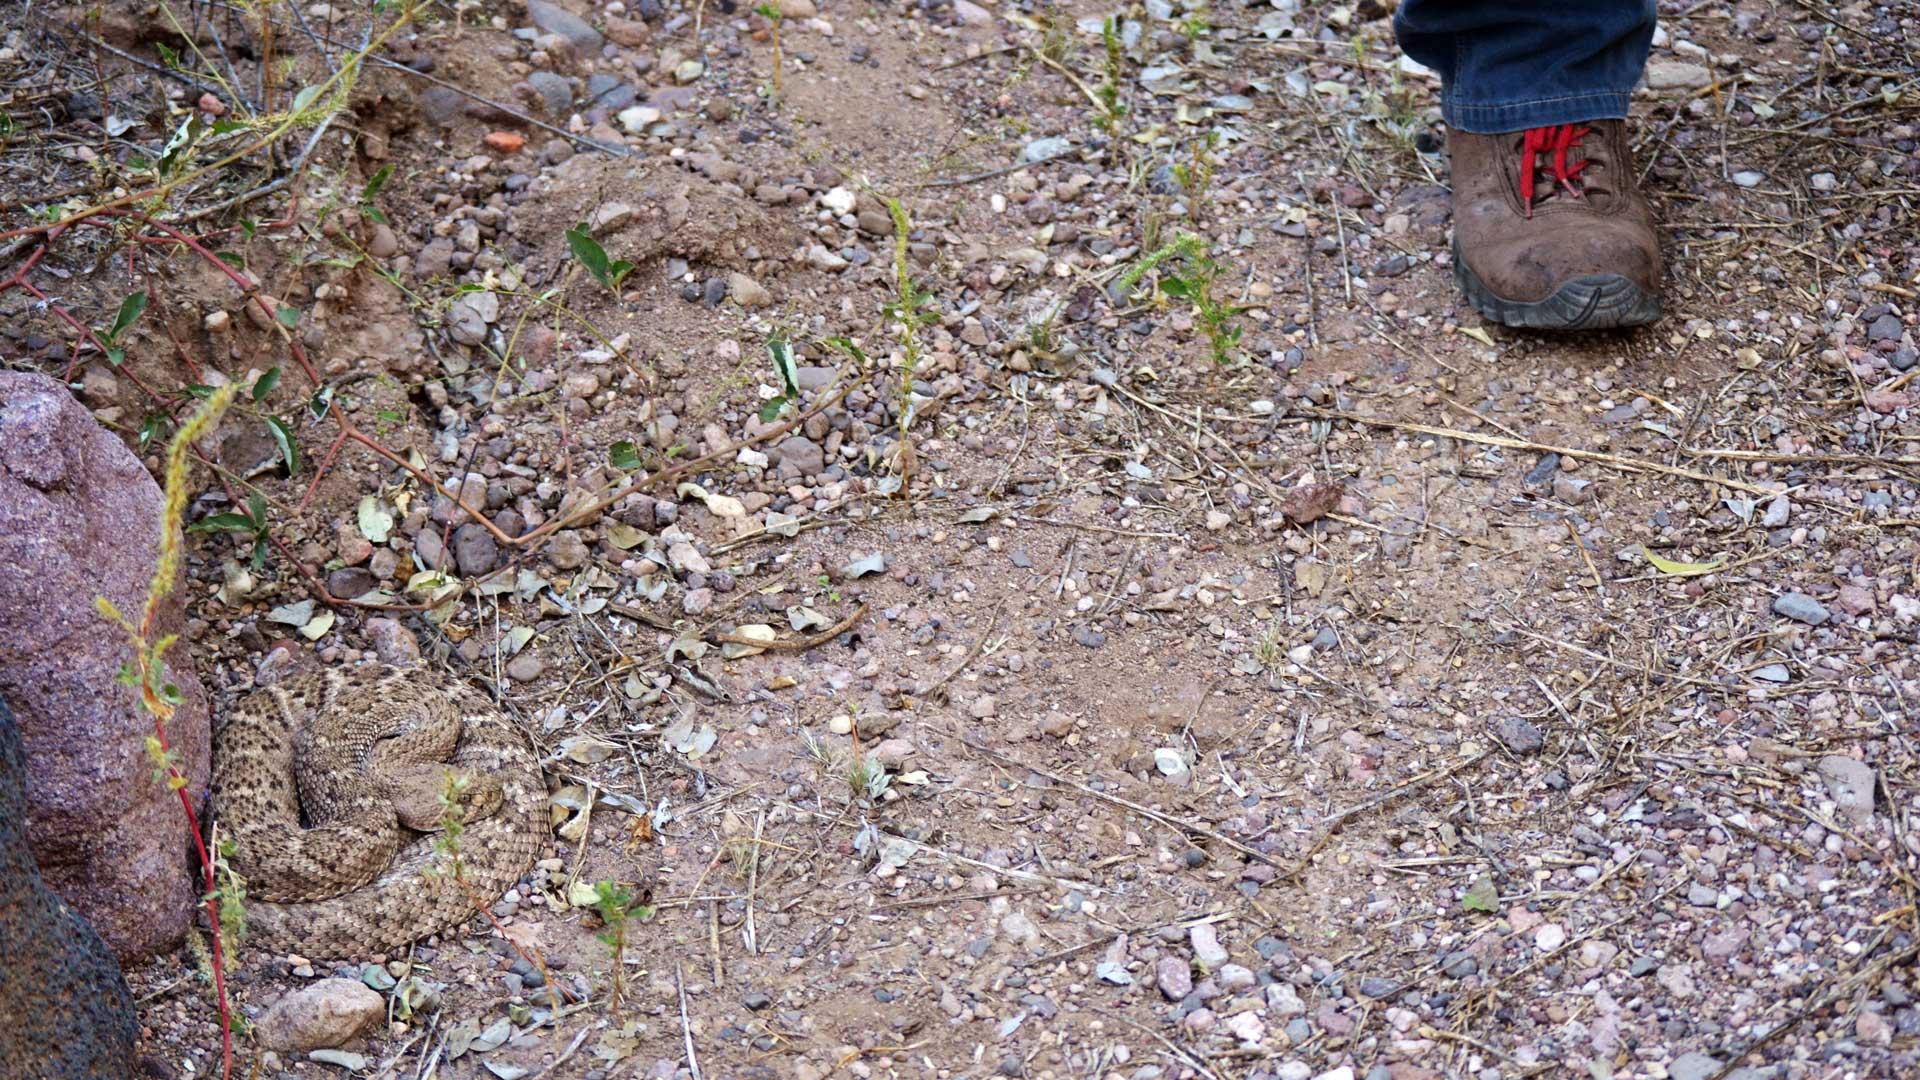 Stepping near western diamondback rattlesnake